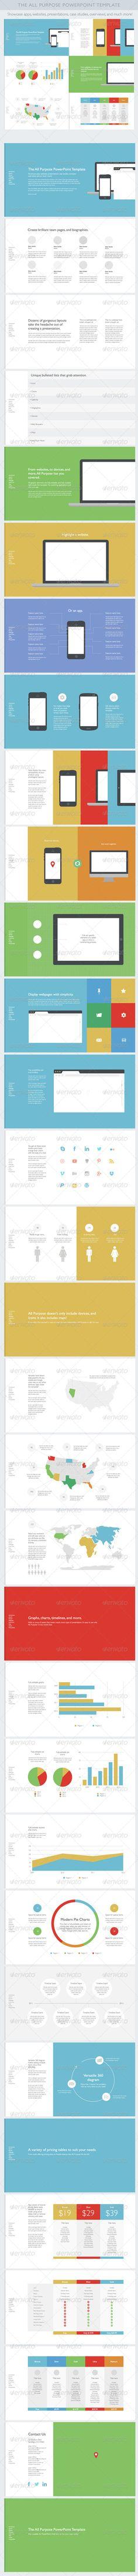 Flat All Purpose PowerPoint Template - Presentation Templates